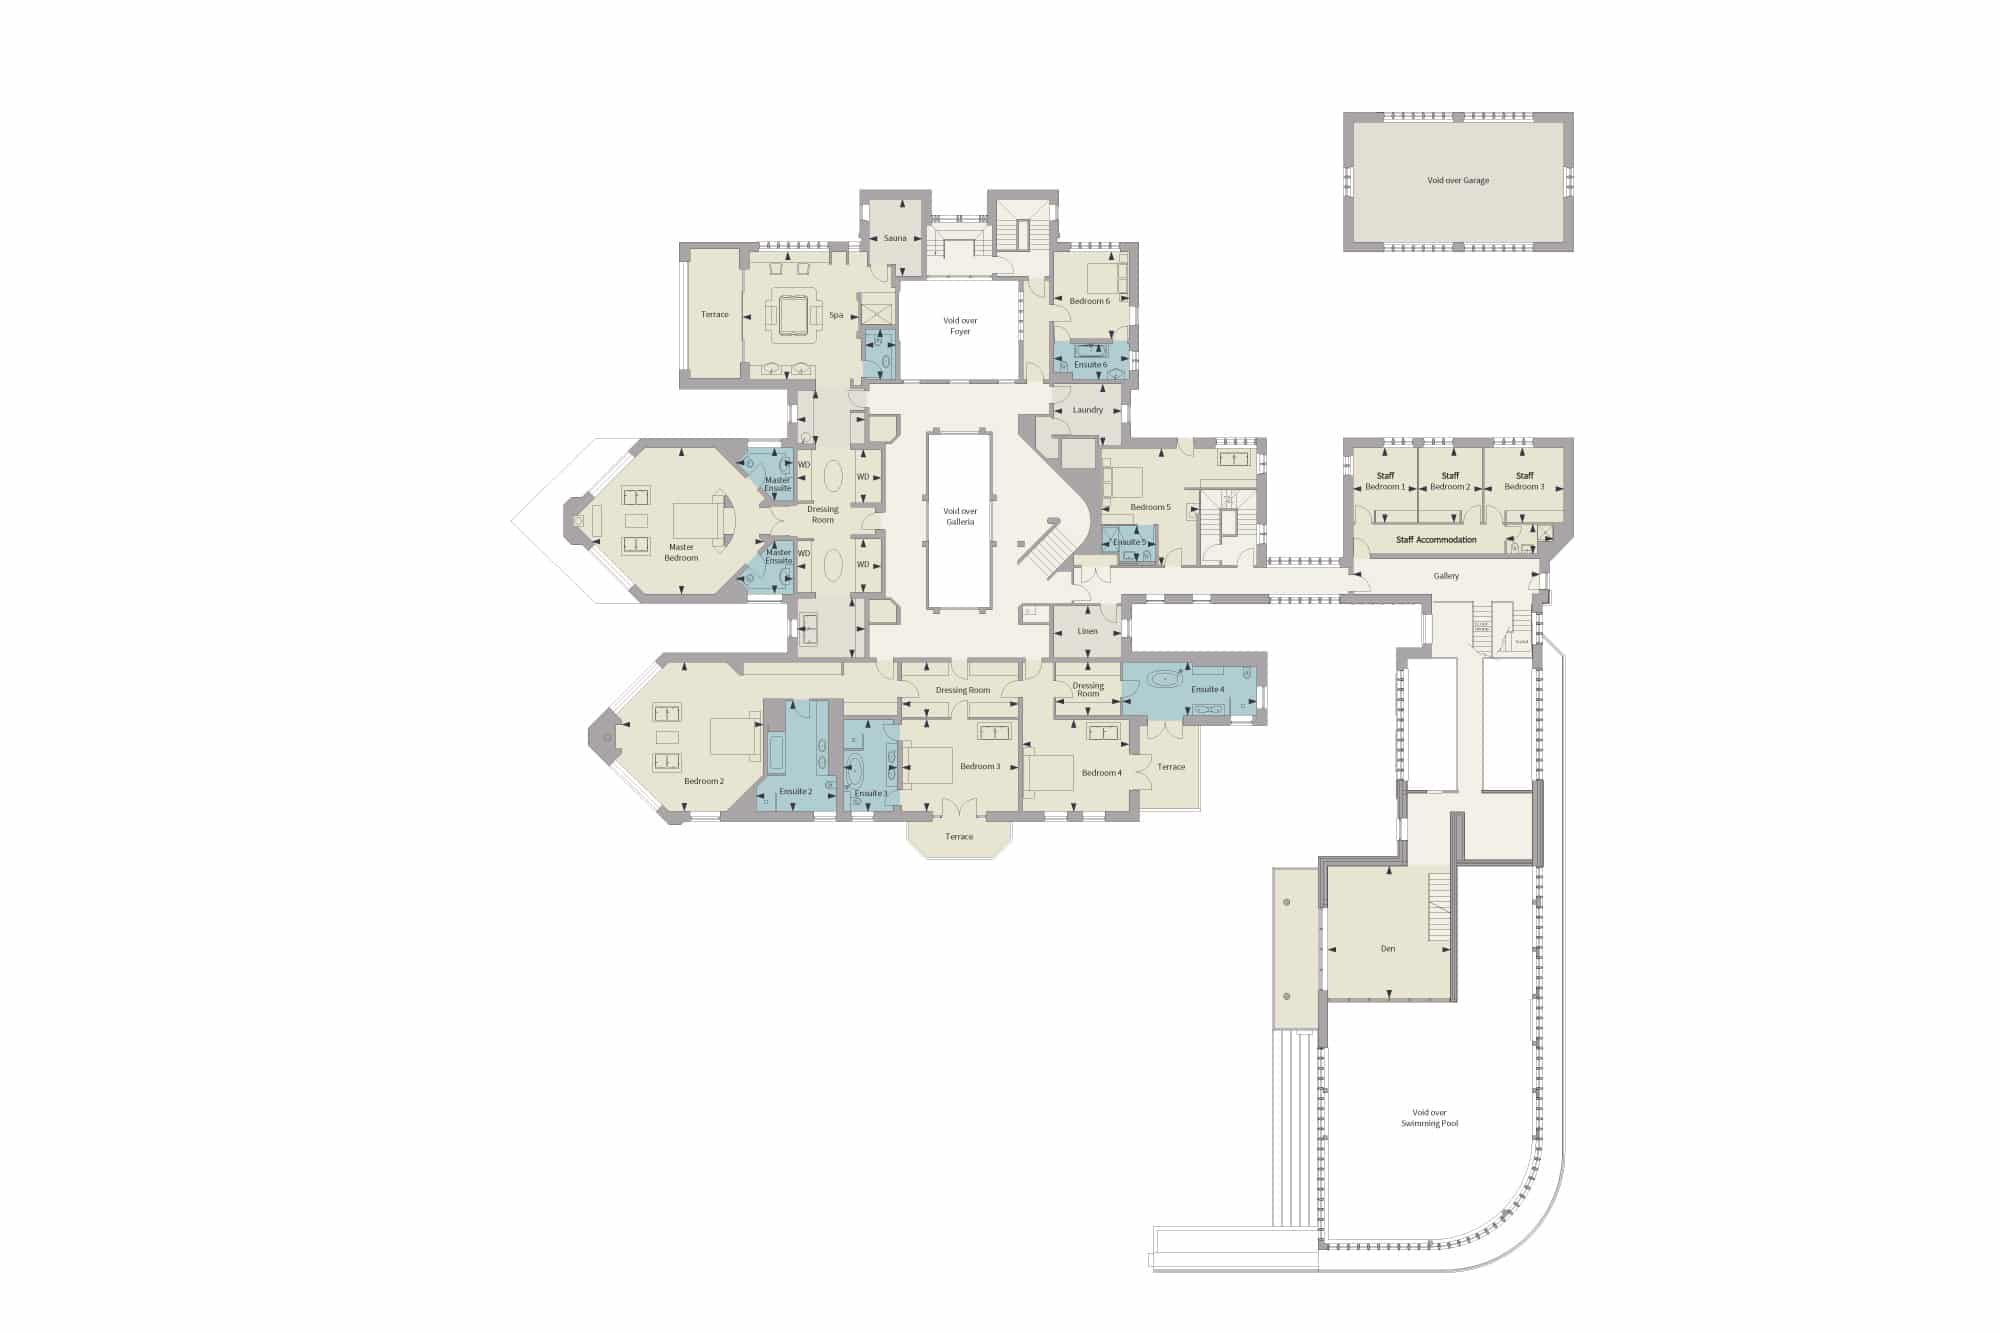 Harford Manor First Floor Floorplan